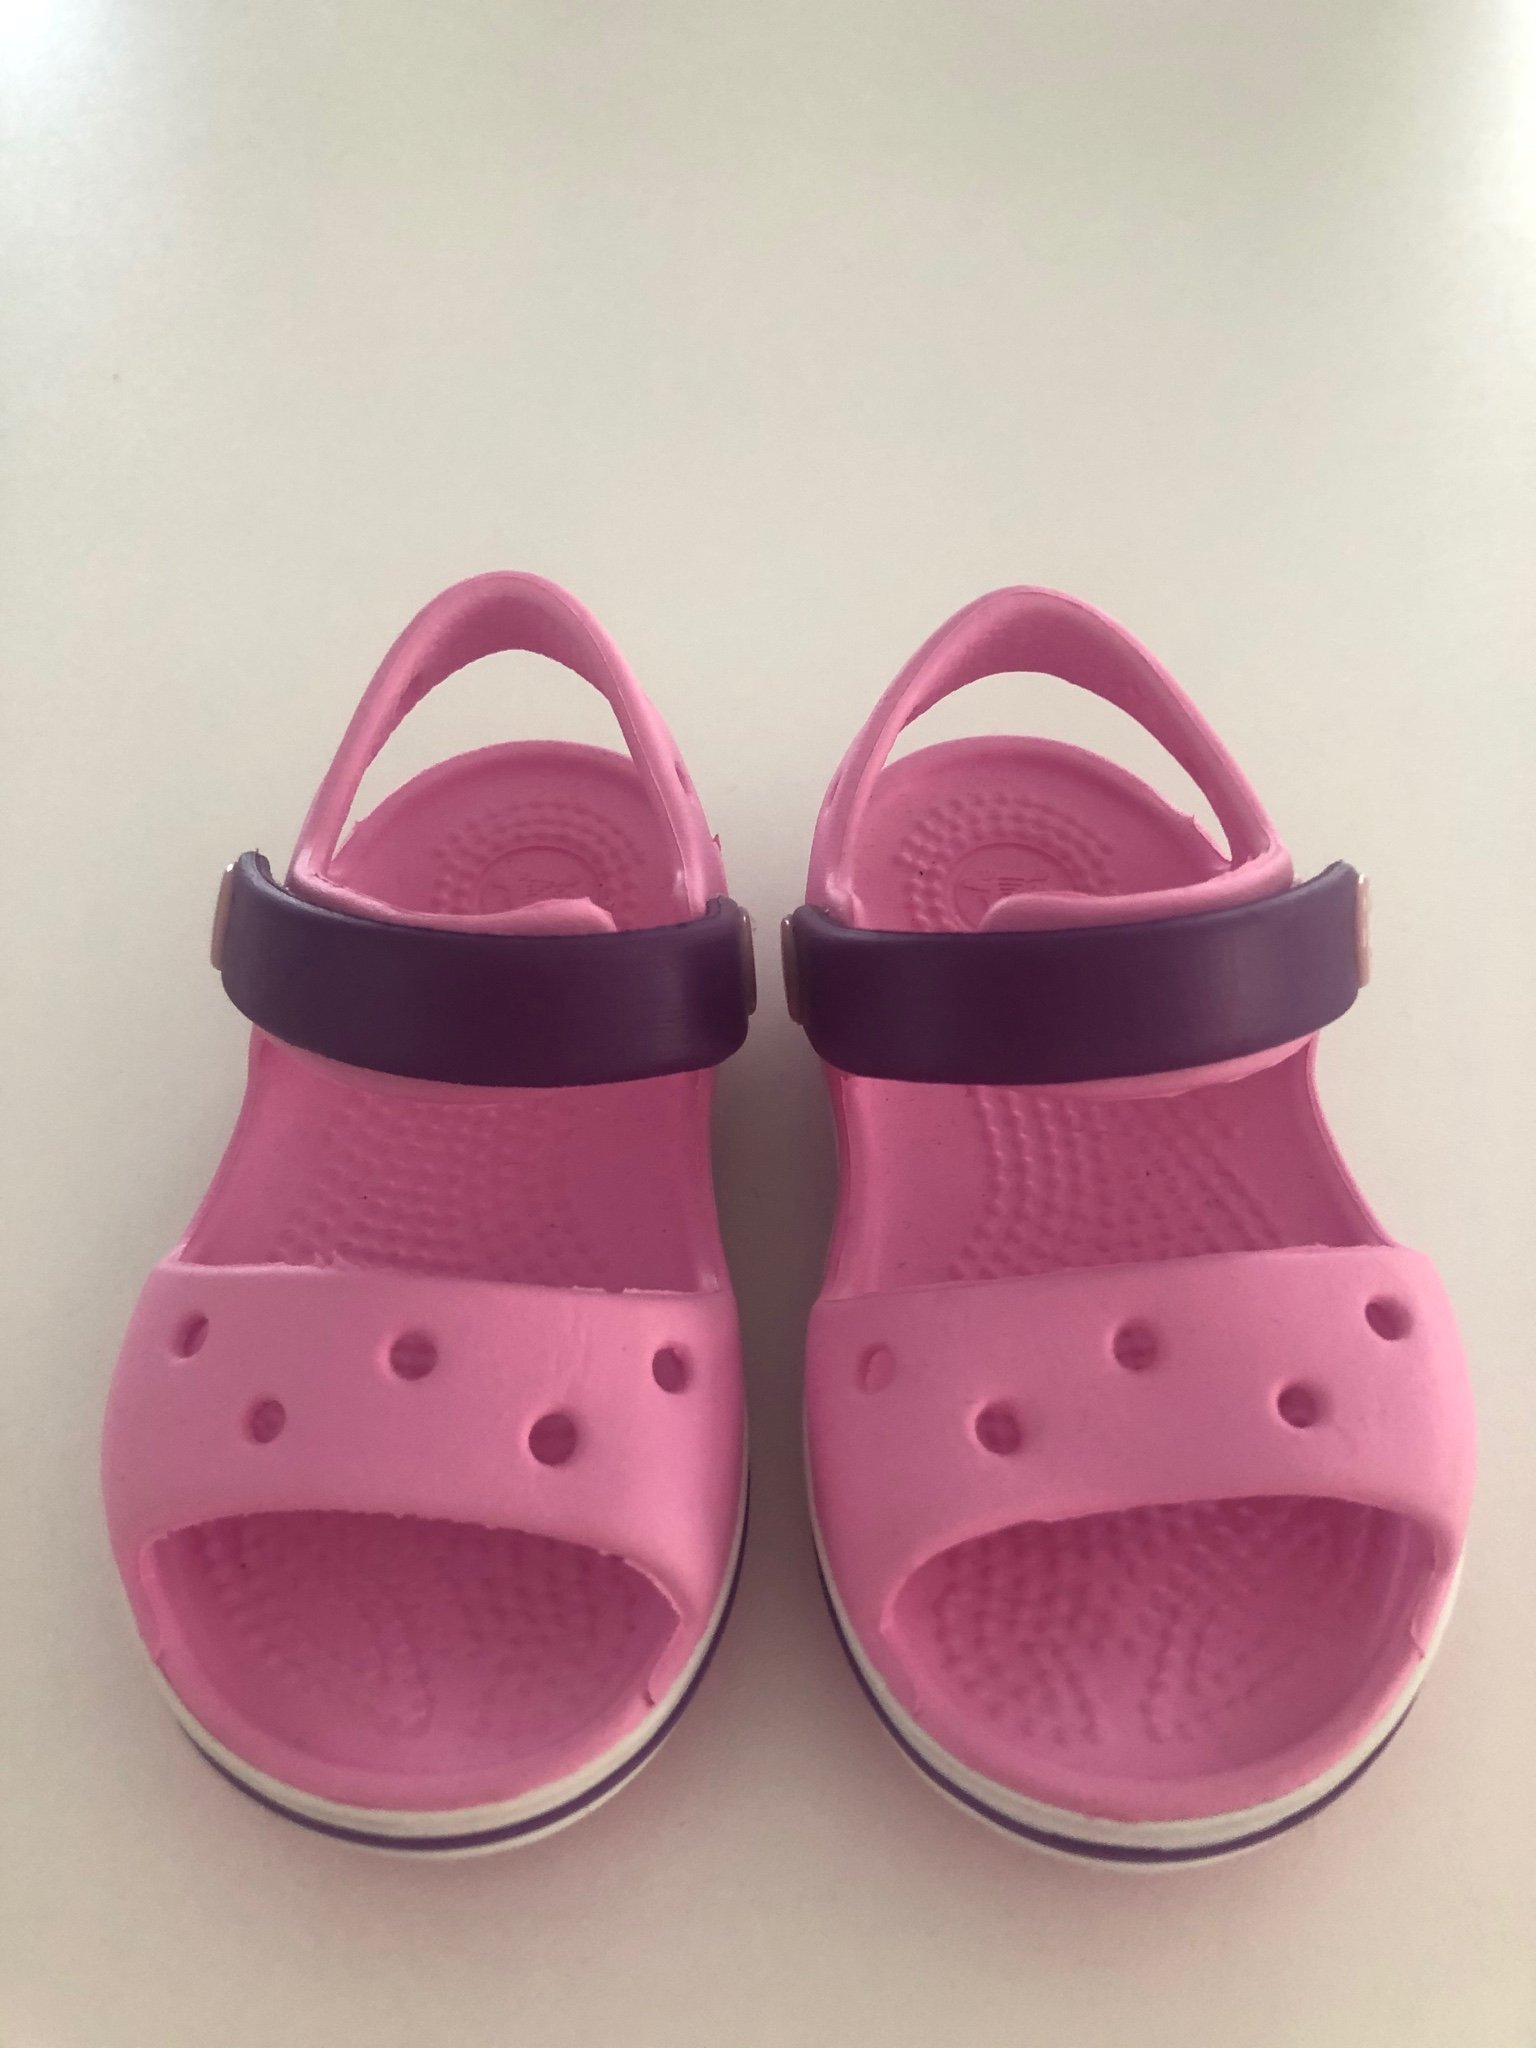 Crocs sandal stl C5 (stl ca 21 22)